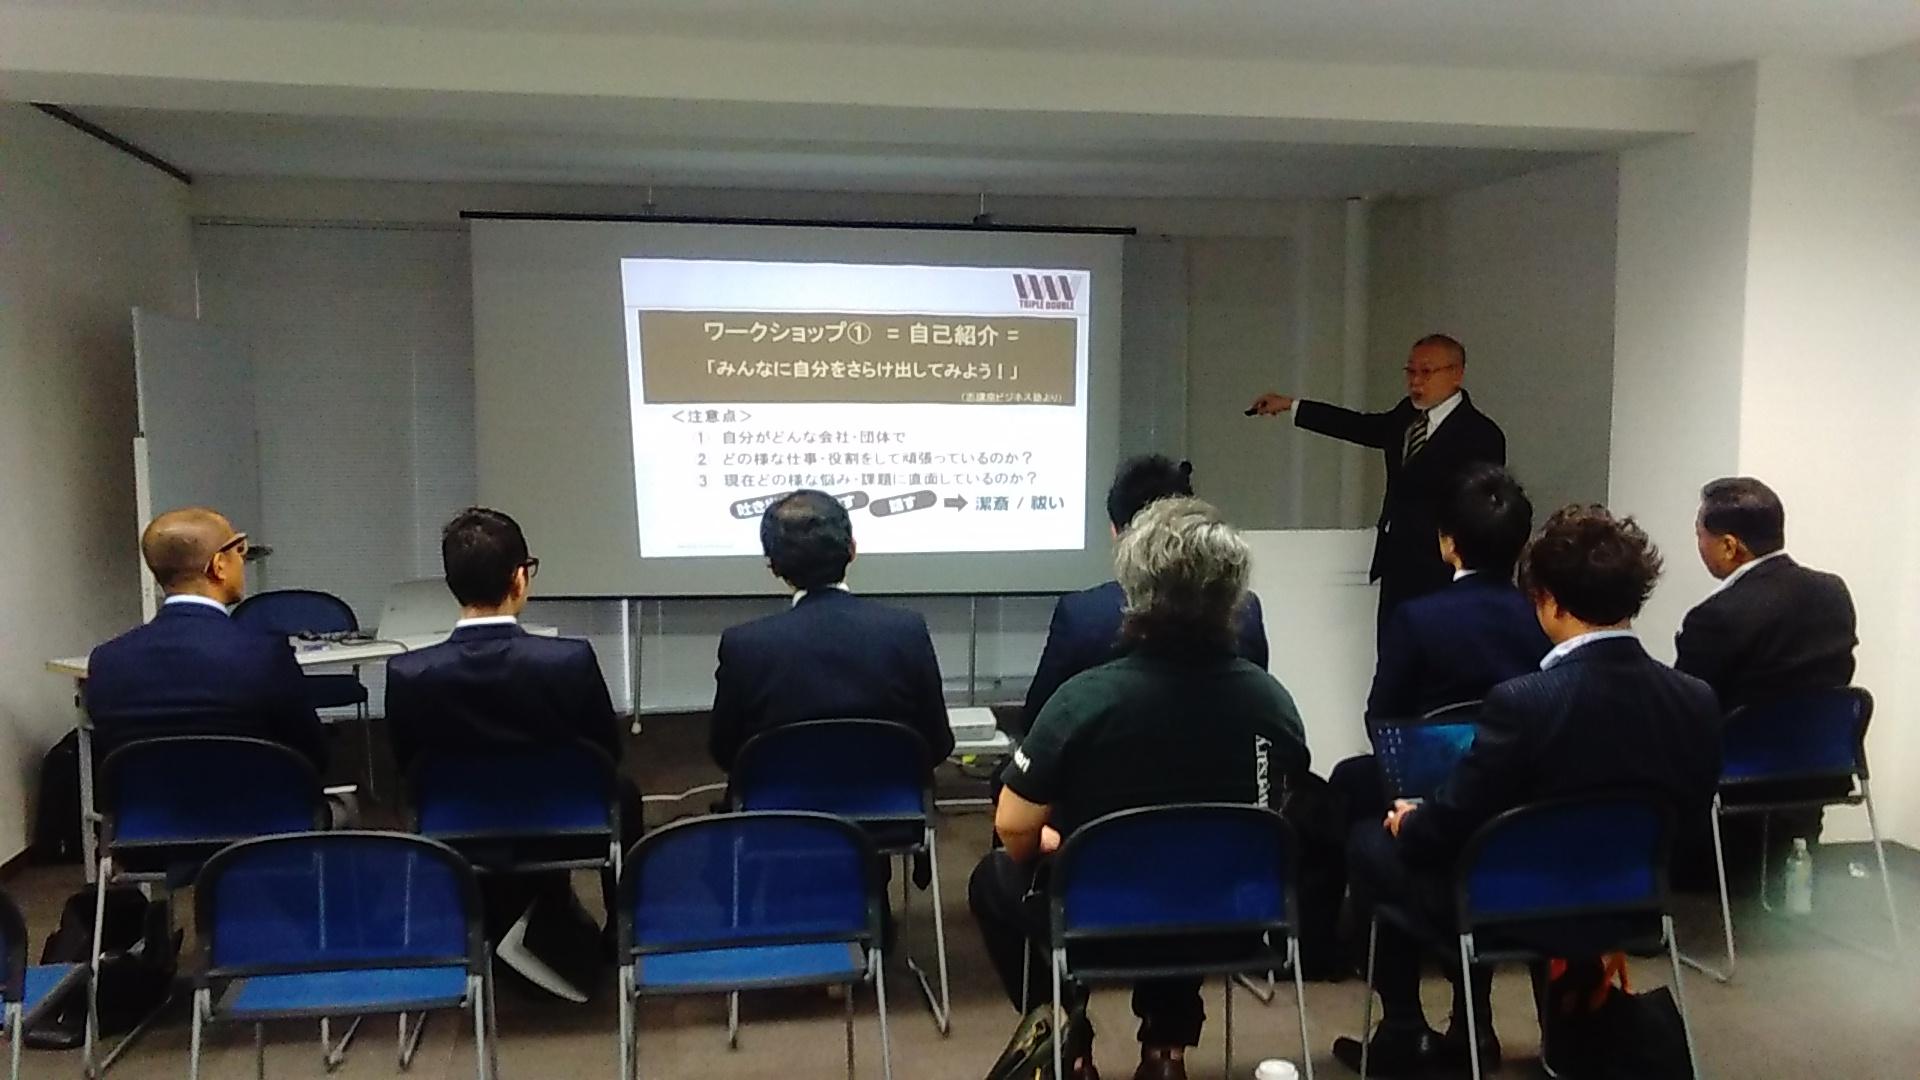 KIMG0733 - 猛獣塾入門講座開催しました。